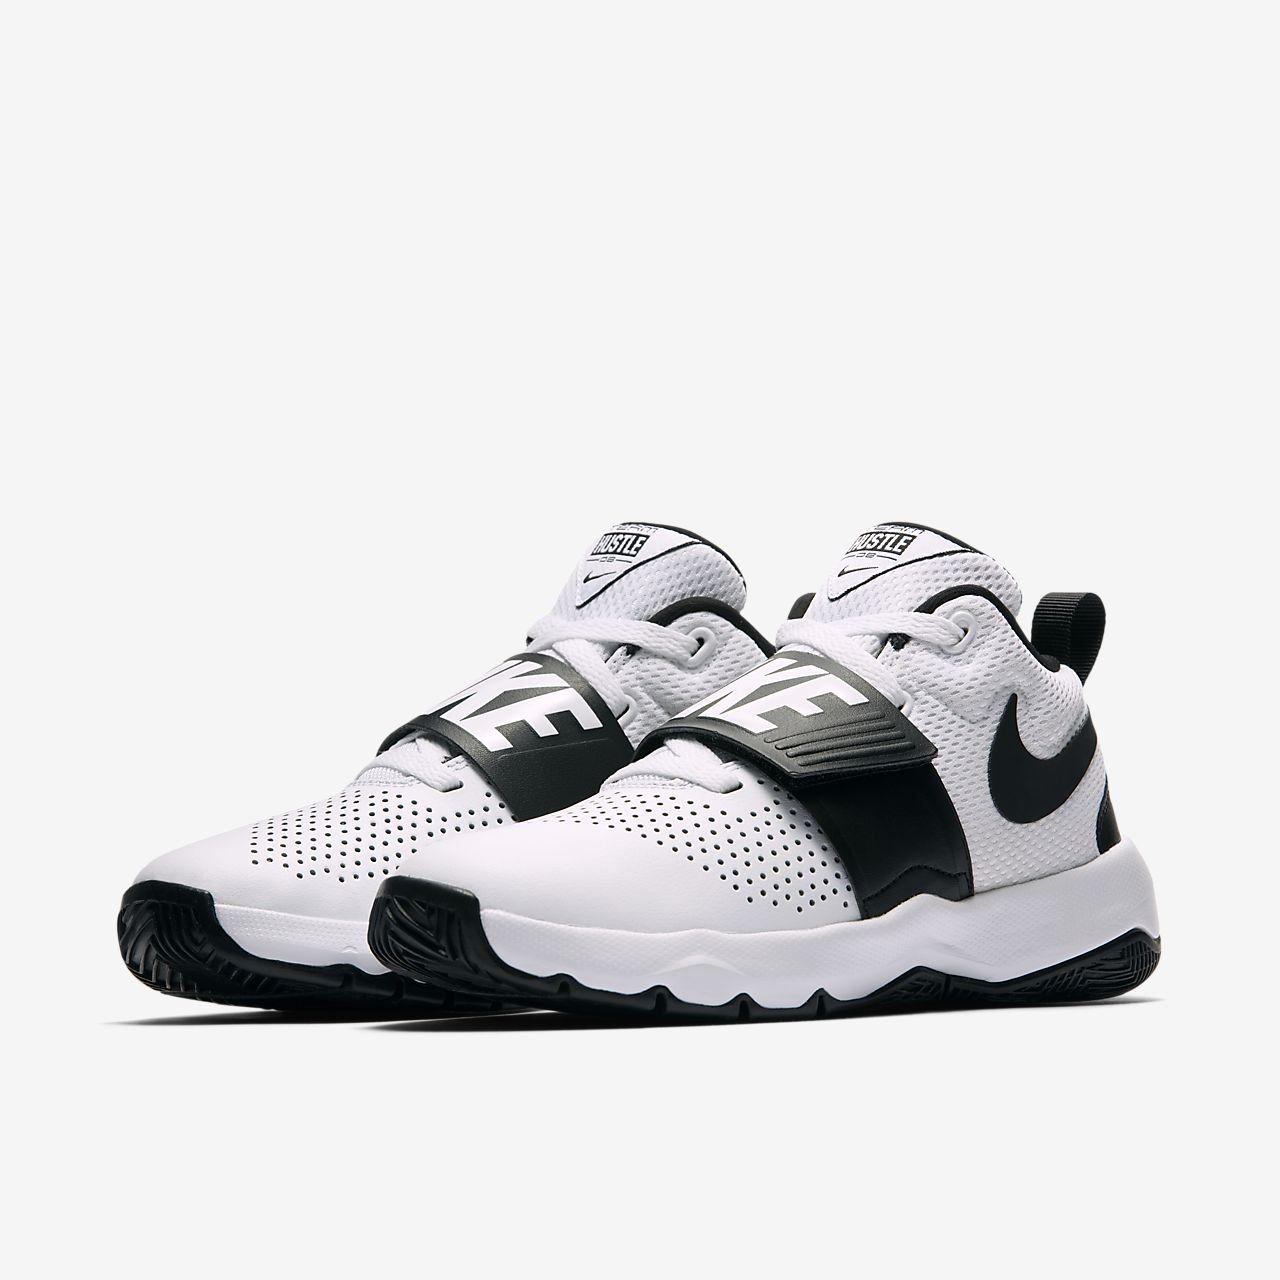 ... Nike Team Hustle D 8 Older Kids' Basketball Shoe